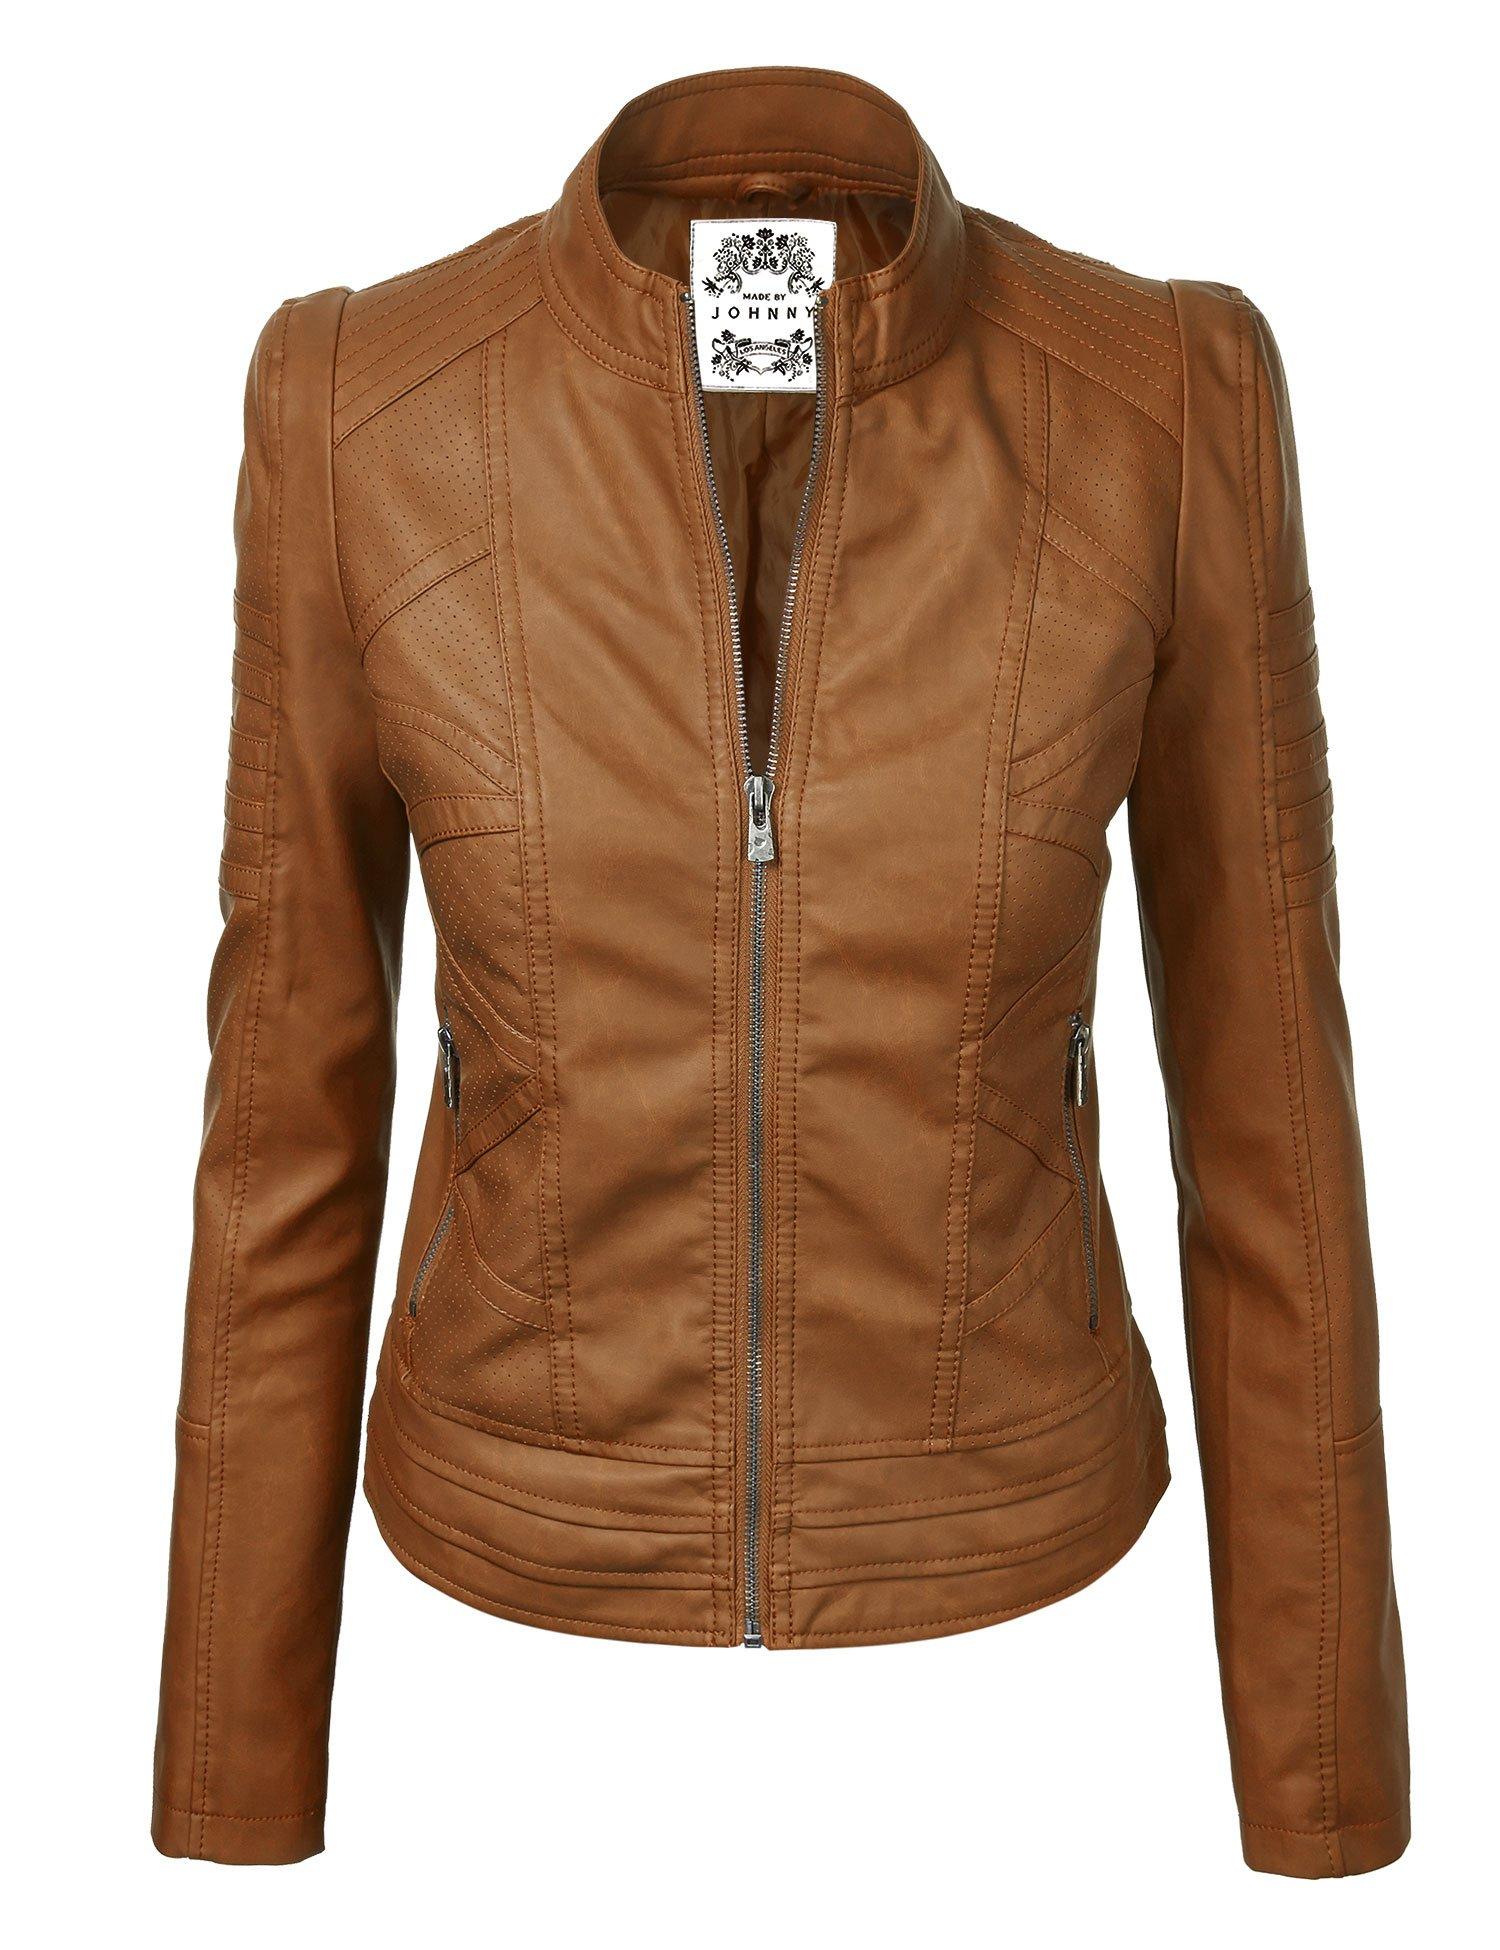 WJC746 Womens Vegan Leather Motorcycle Jacket XL Camel